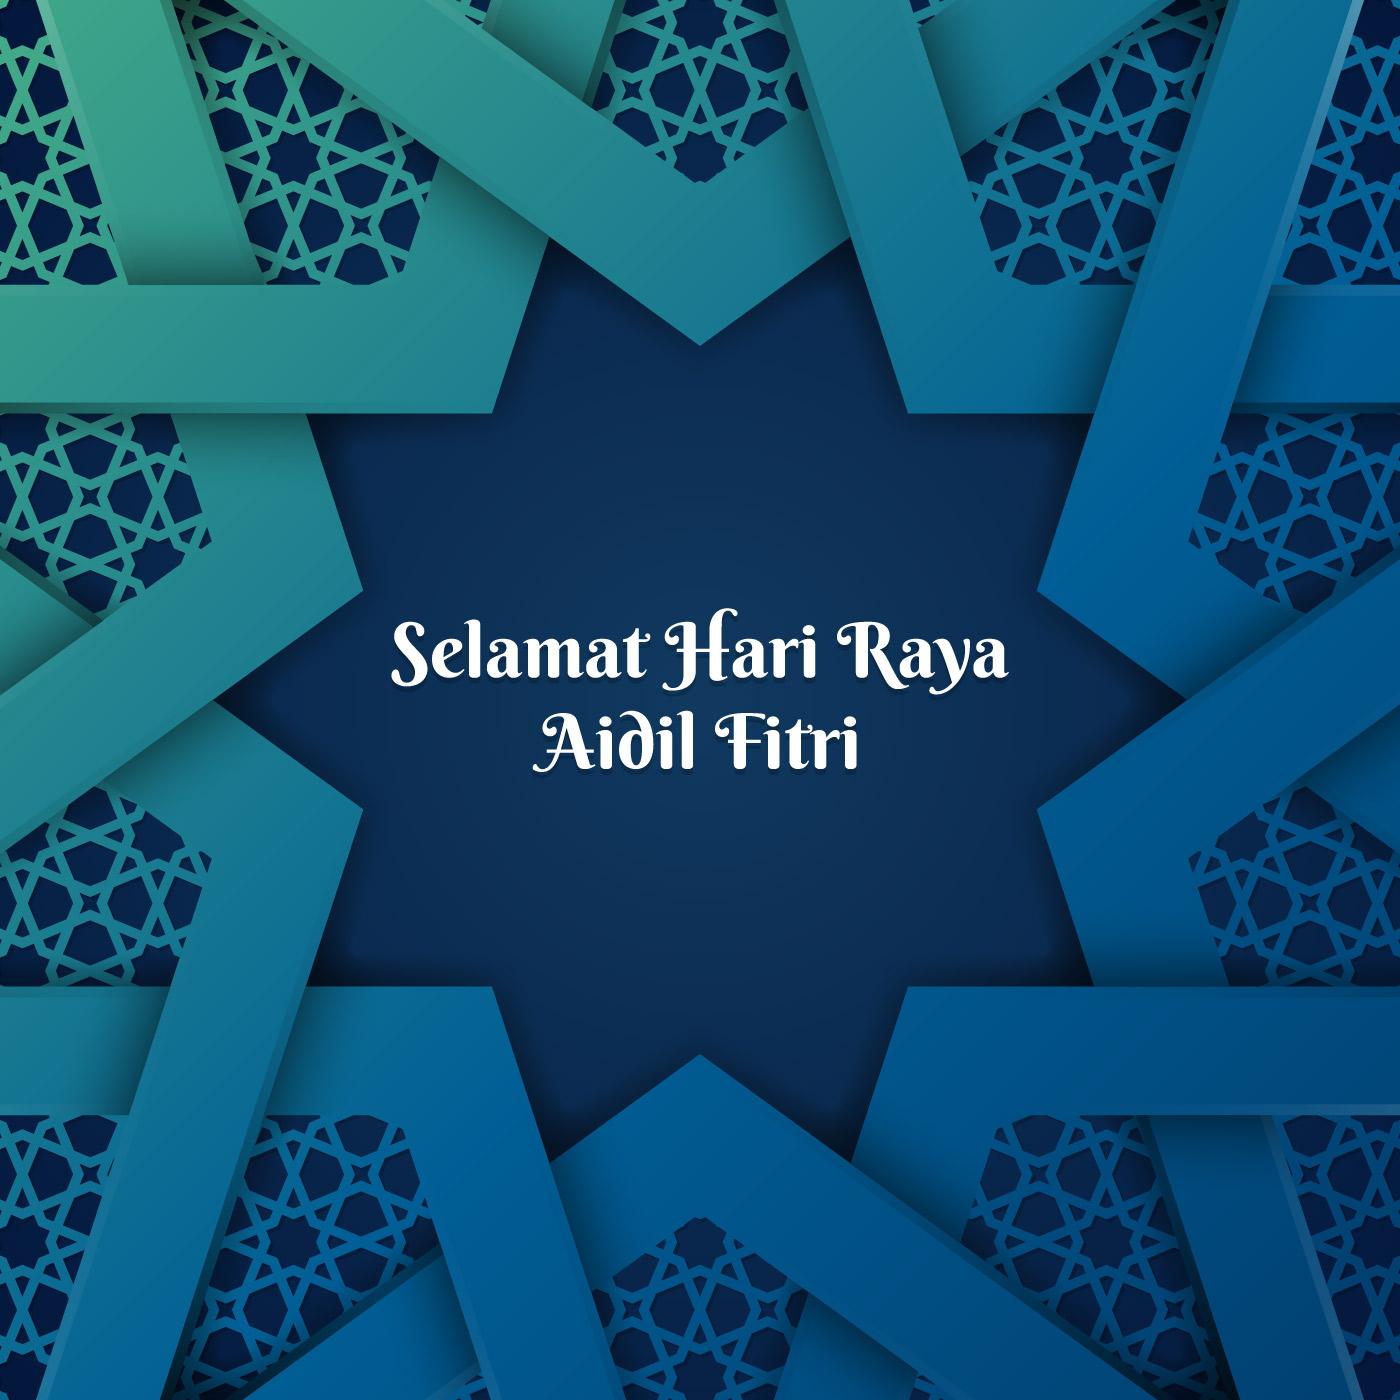 Hari Raya Greeting Template Islamic Architecture Pattern